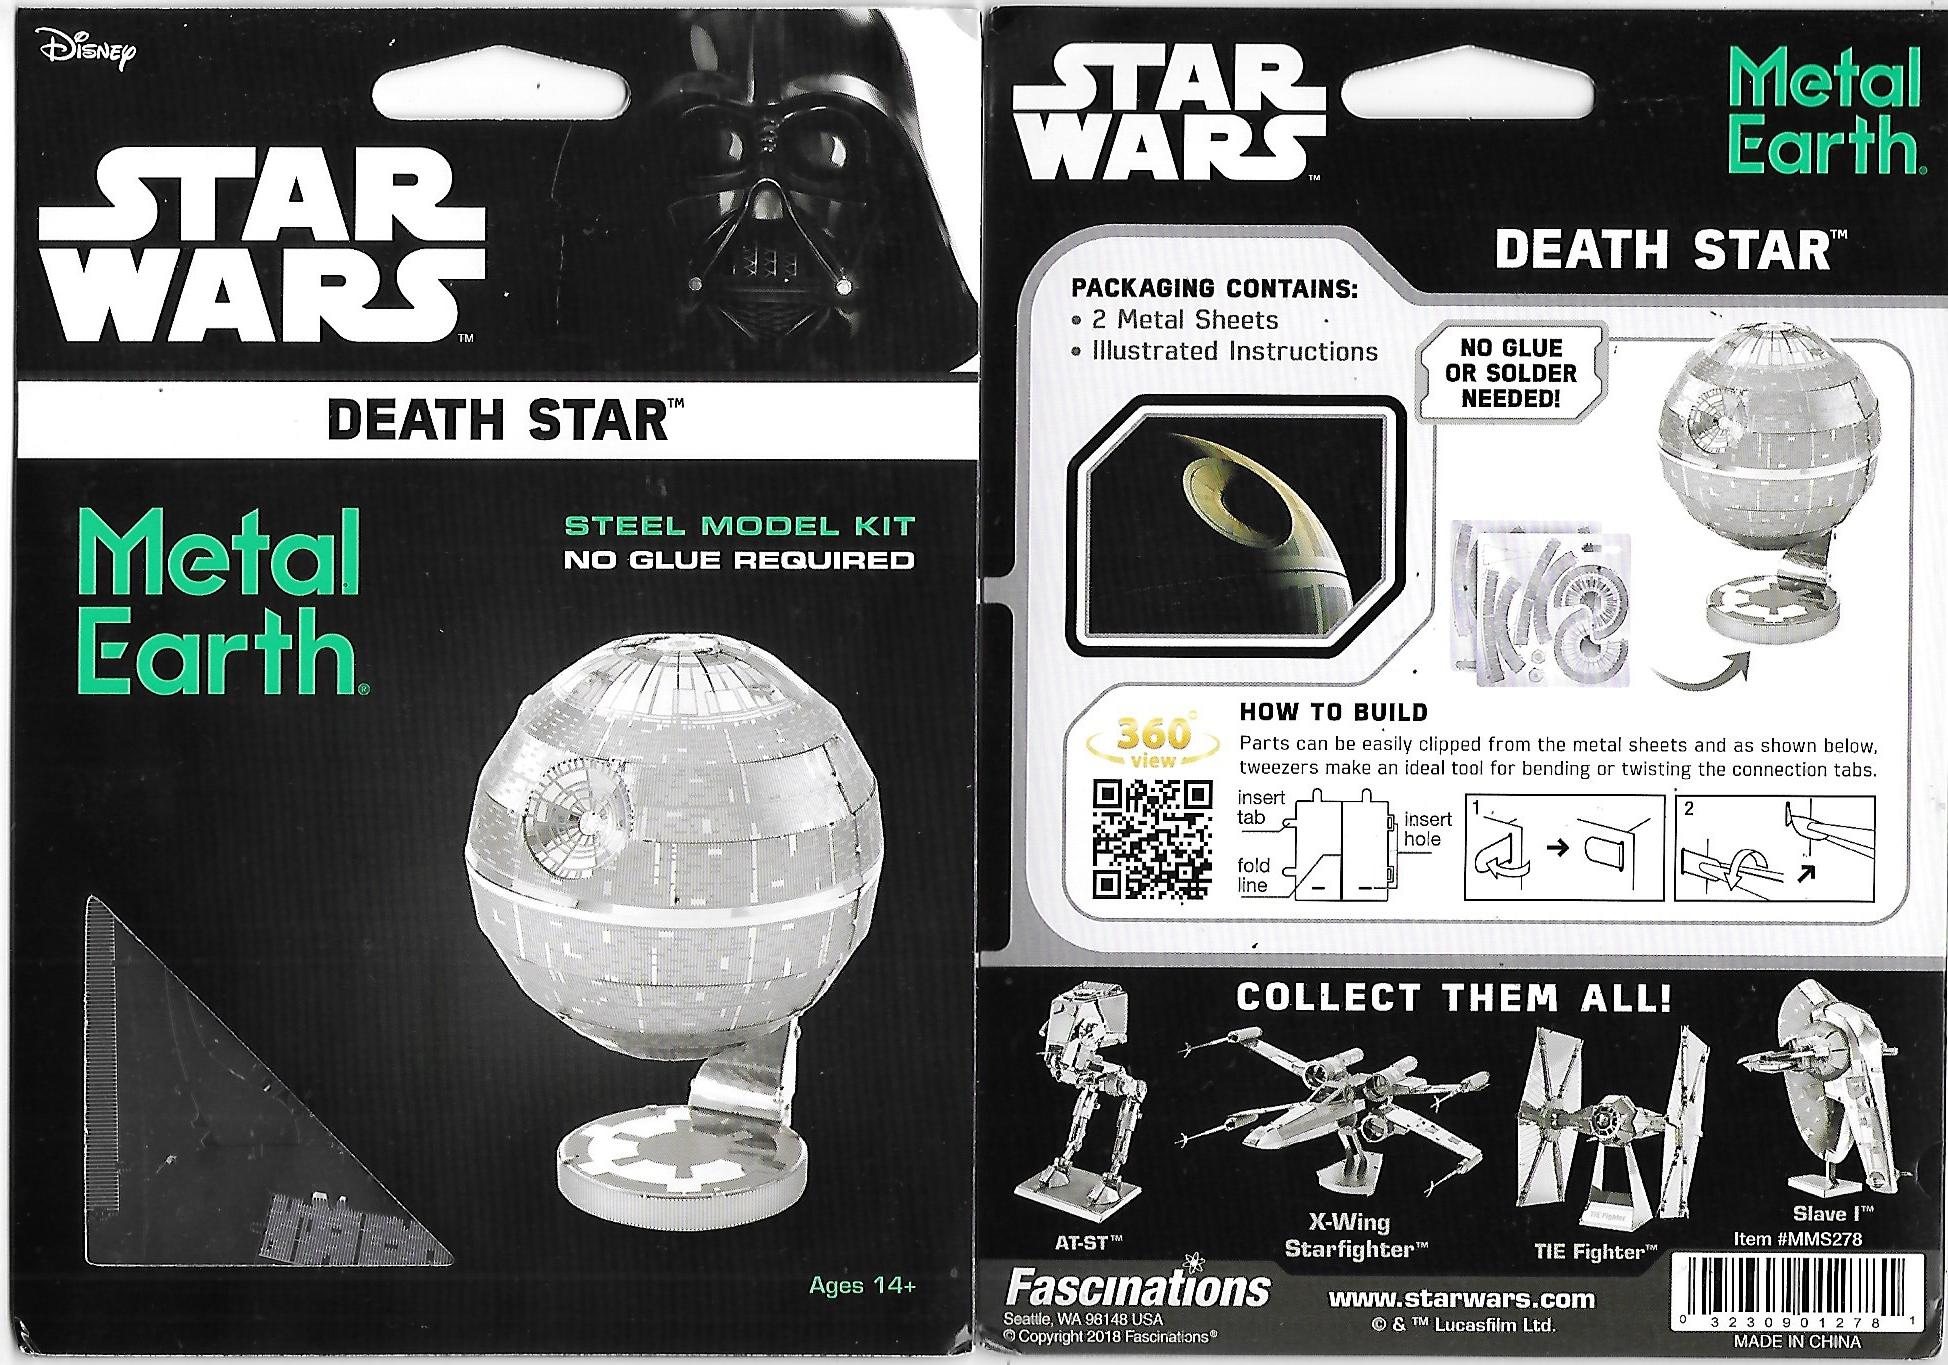 Star Wars Death Star Metal Earth 3-D Laser Cut Steel Model Kit #MMS278  SEALED